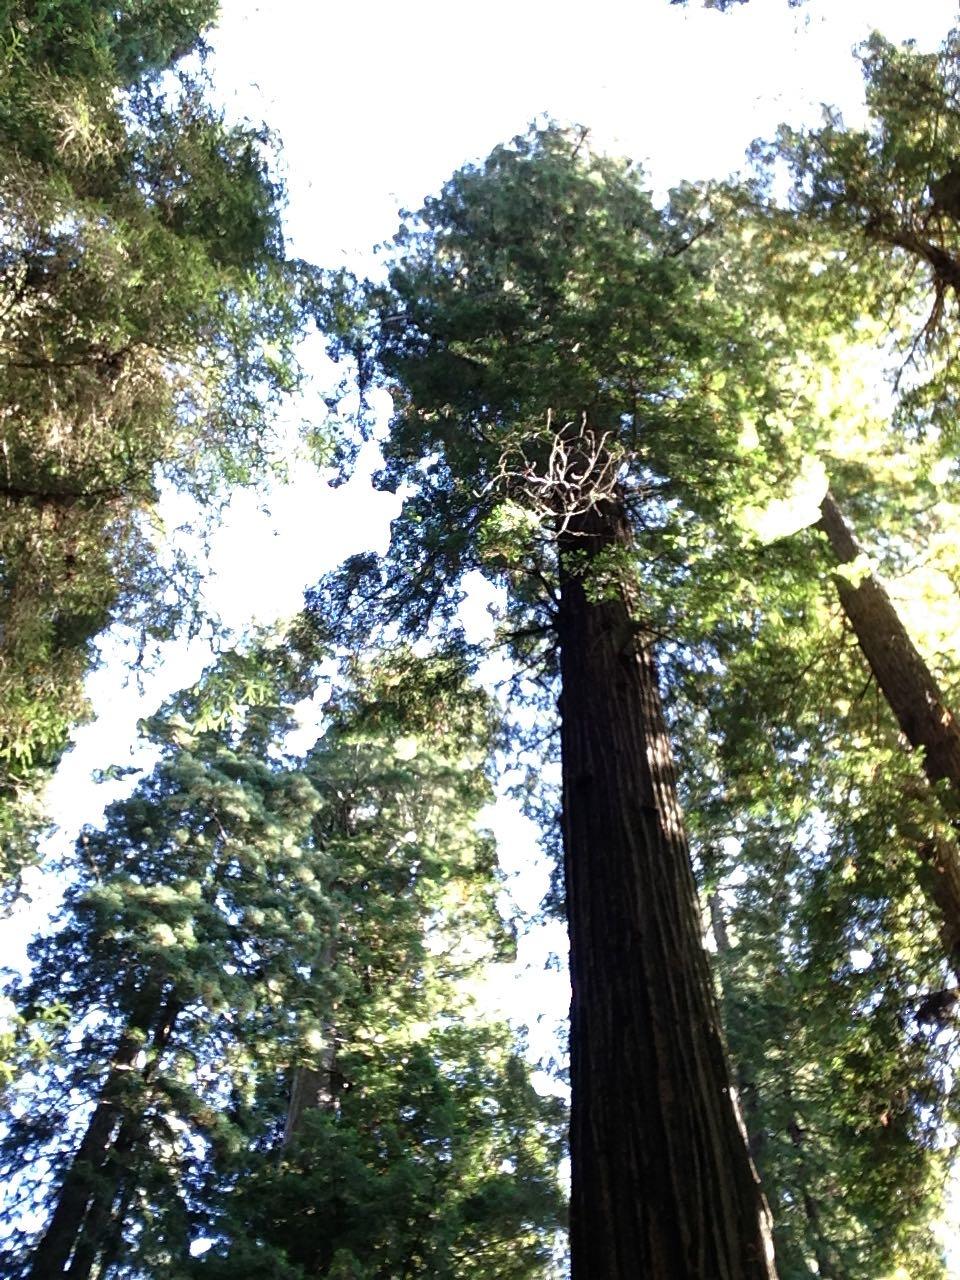 Redwoods 2017 10 08 253 Of 287